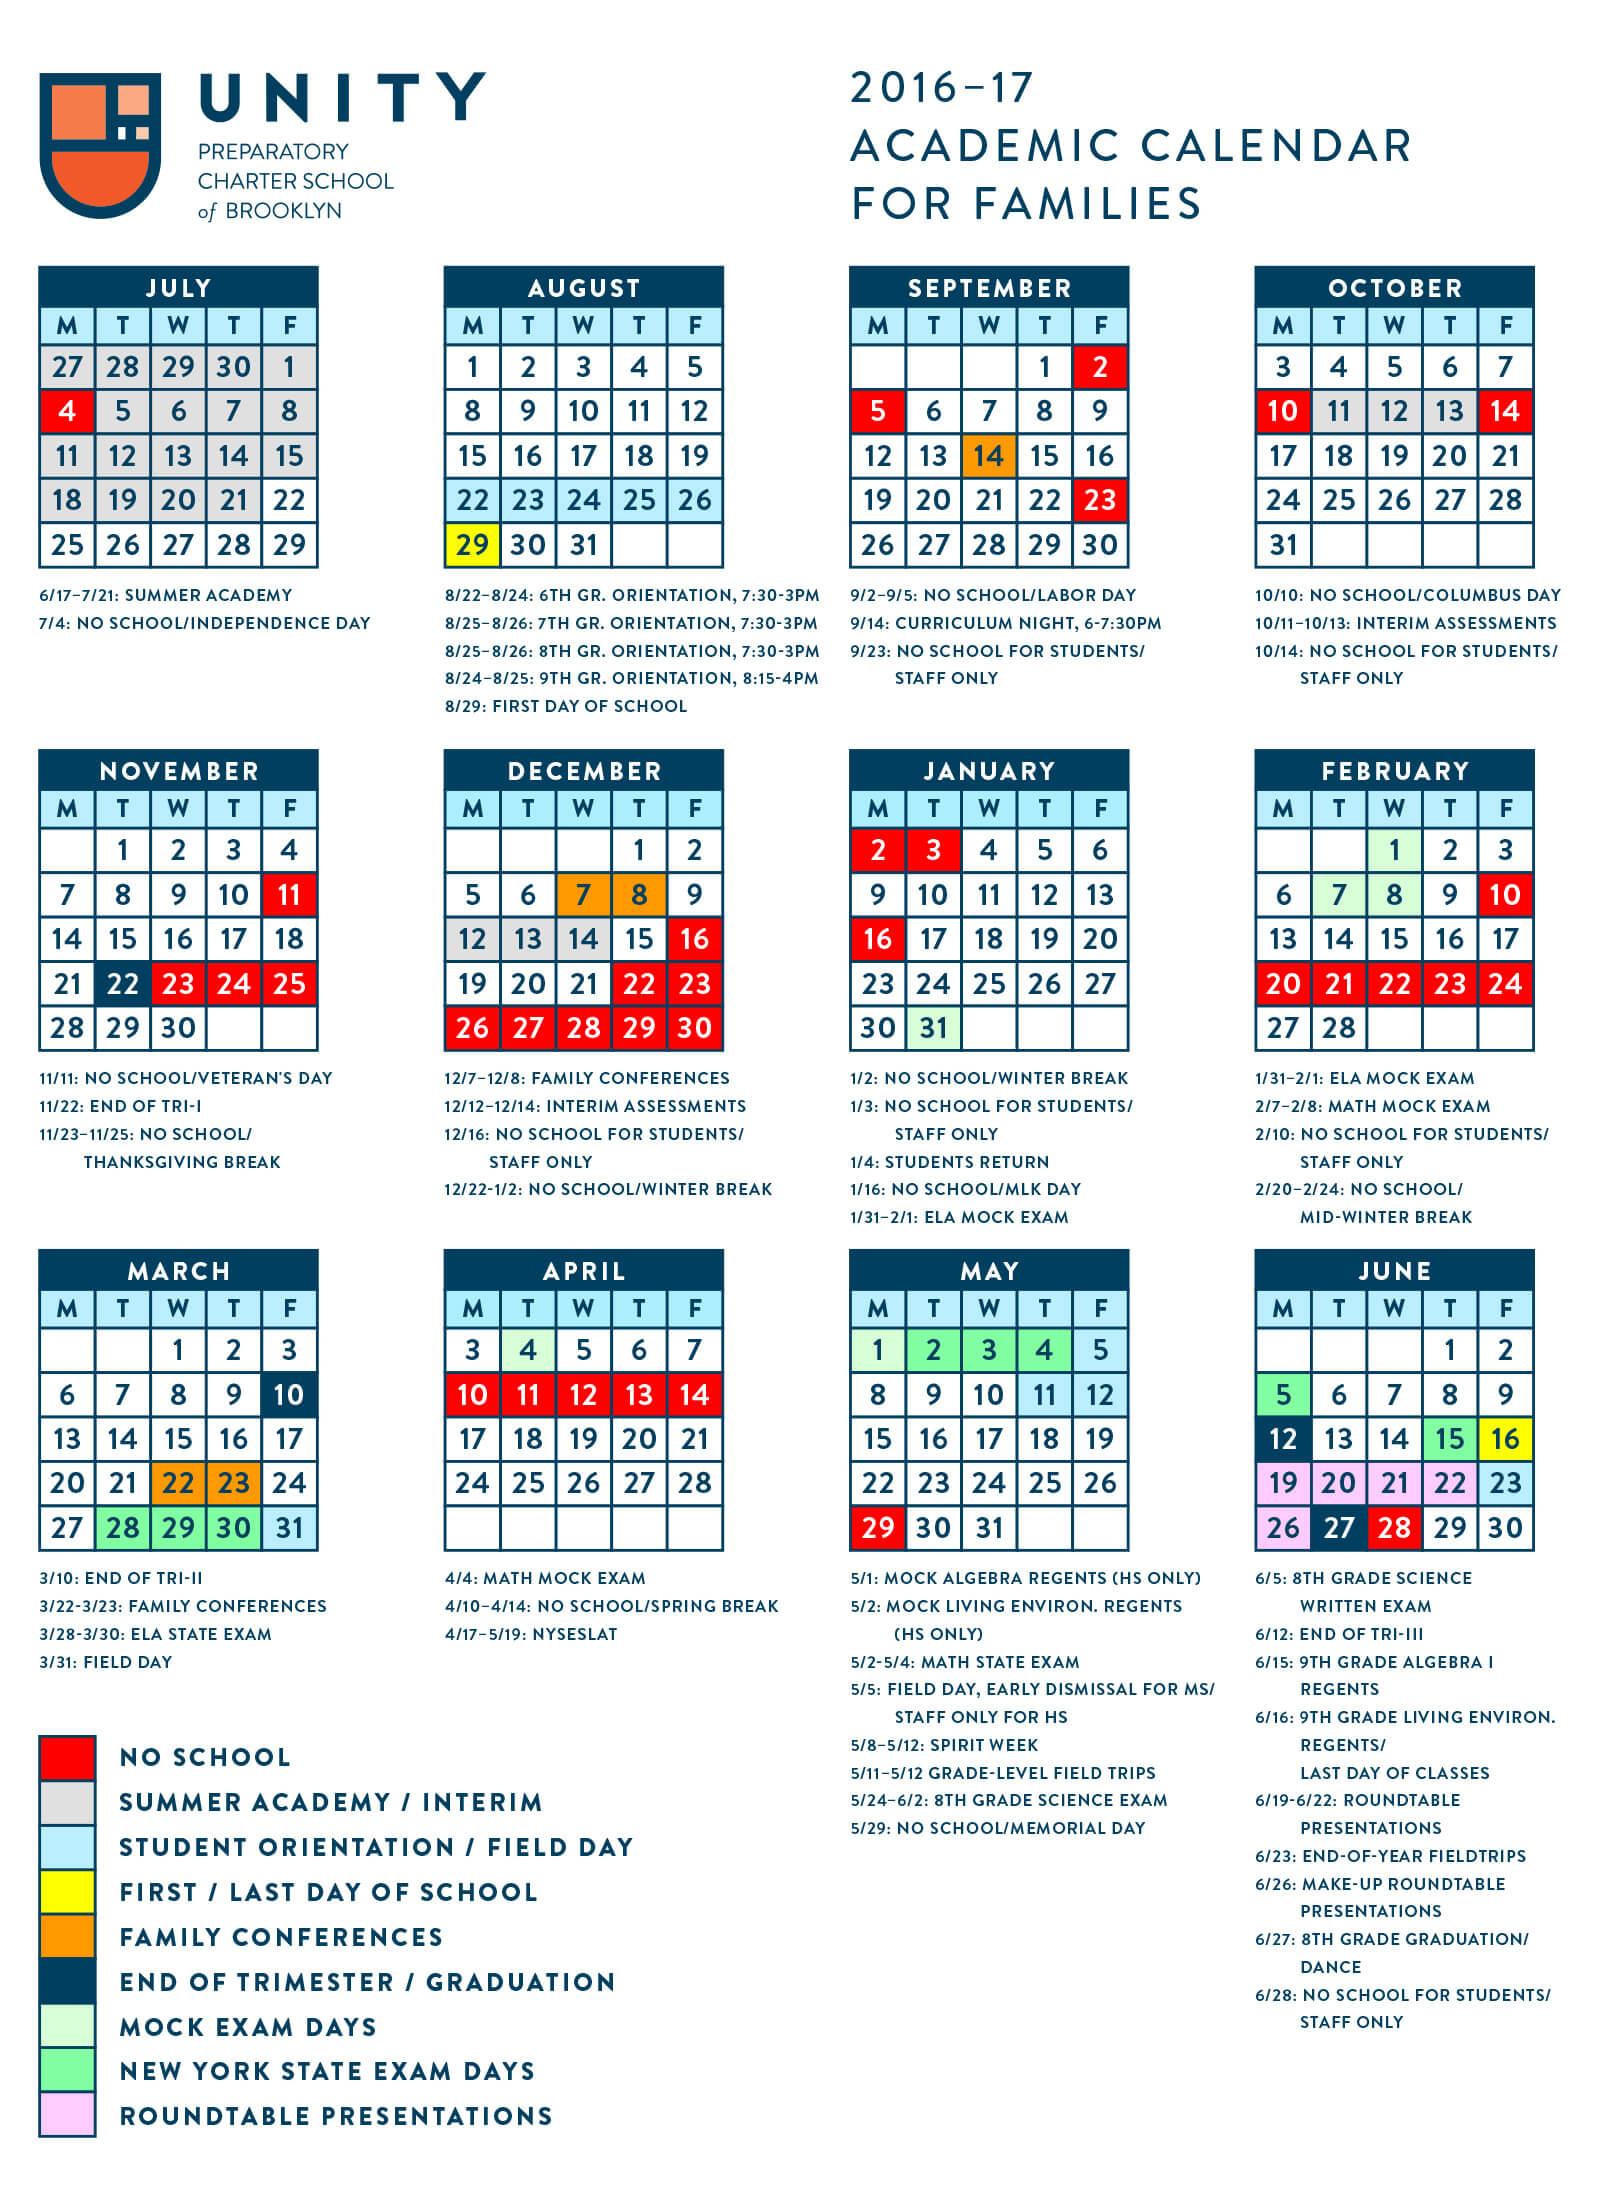 Brooklyn Law School Academic Calendar | | 360 Academic Calendar With Brooklyn Lawacadrmiccalendar